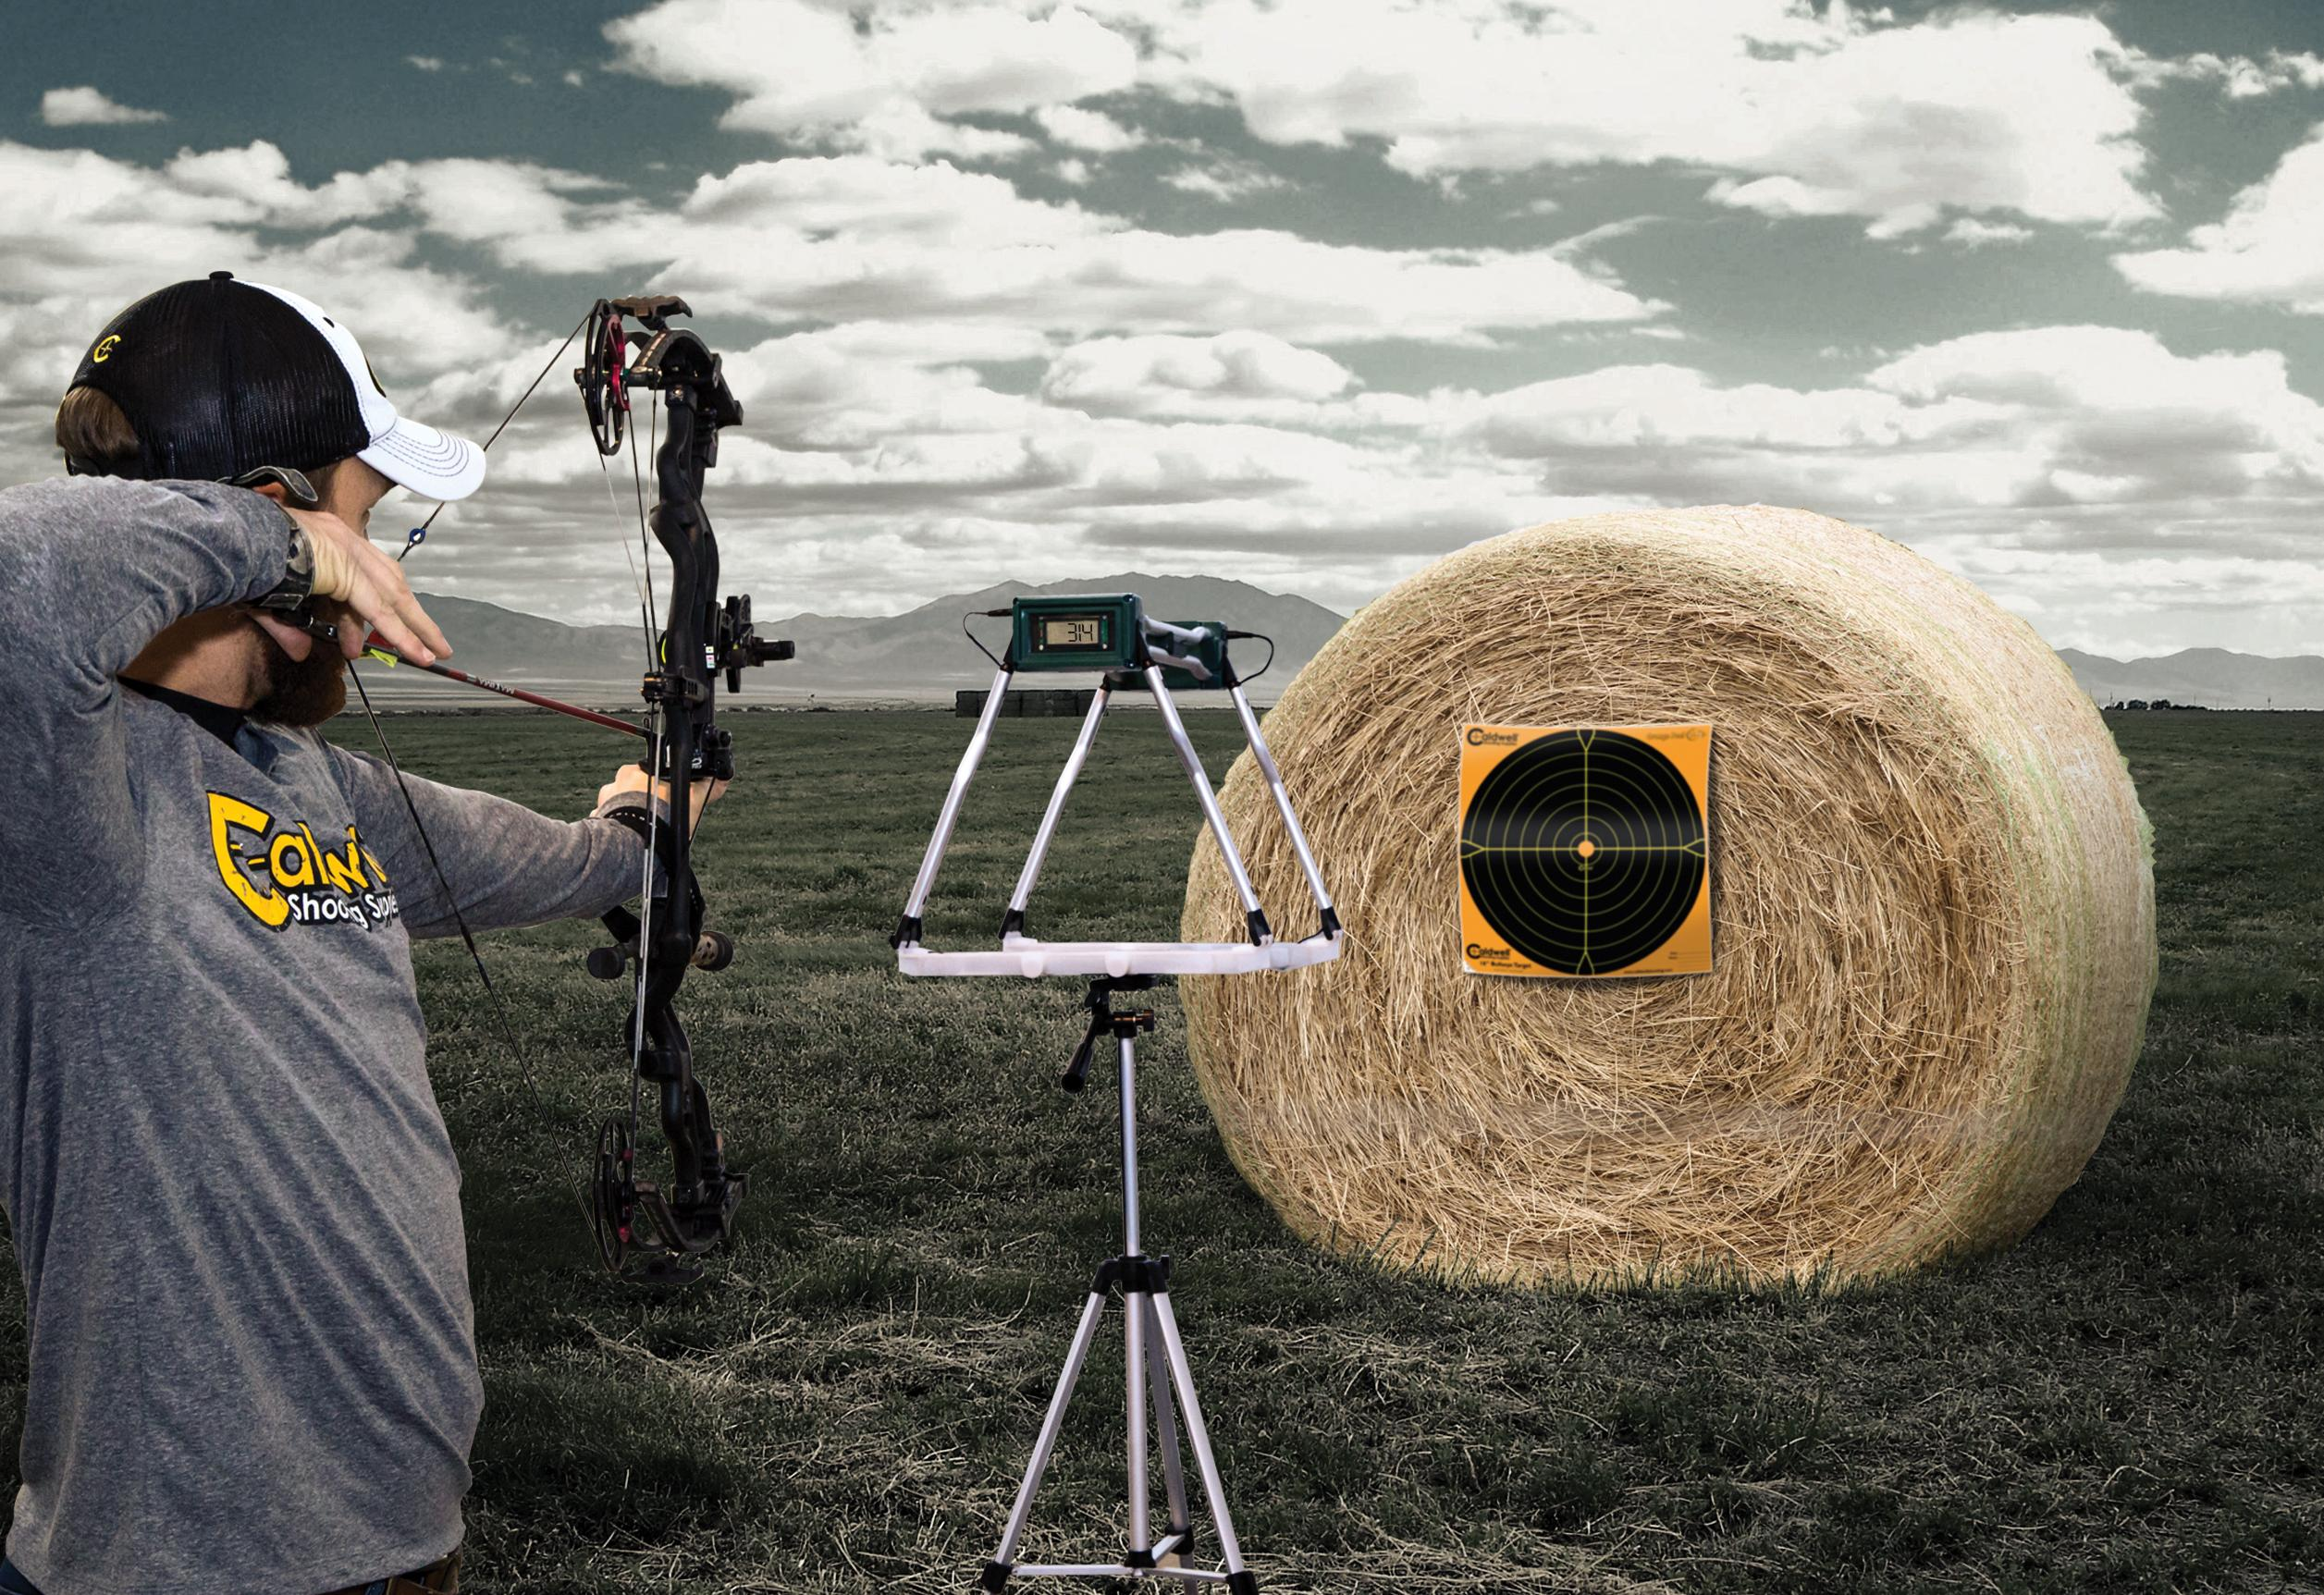 Shooting Material: Amazon.com : Caldwell 720002 G2 Ballistic Precision